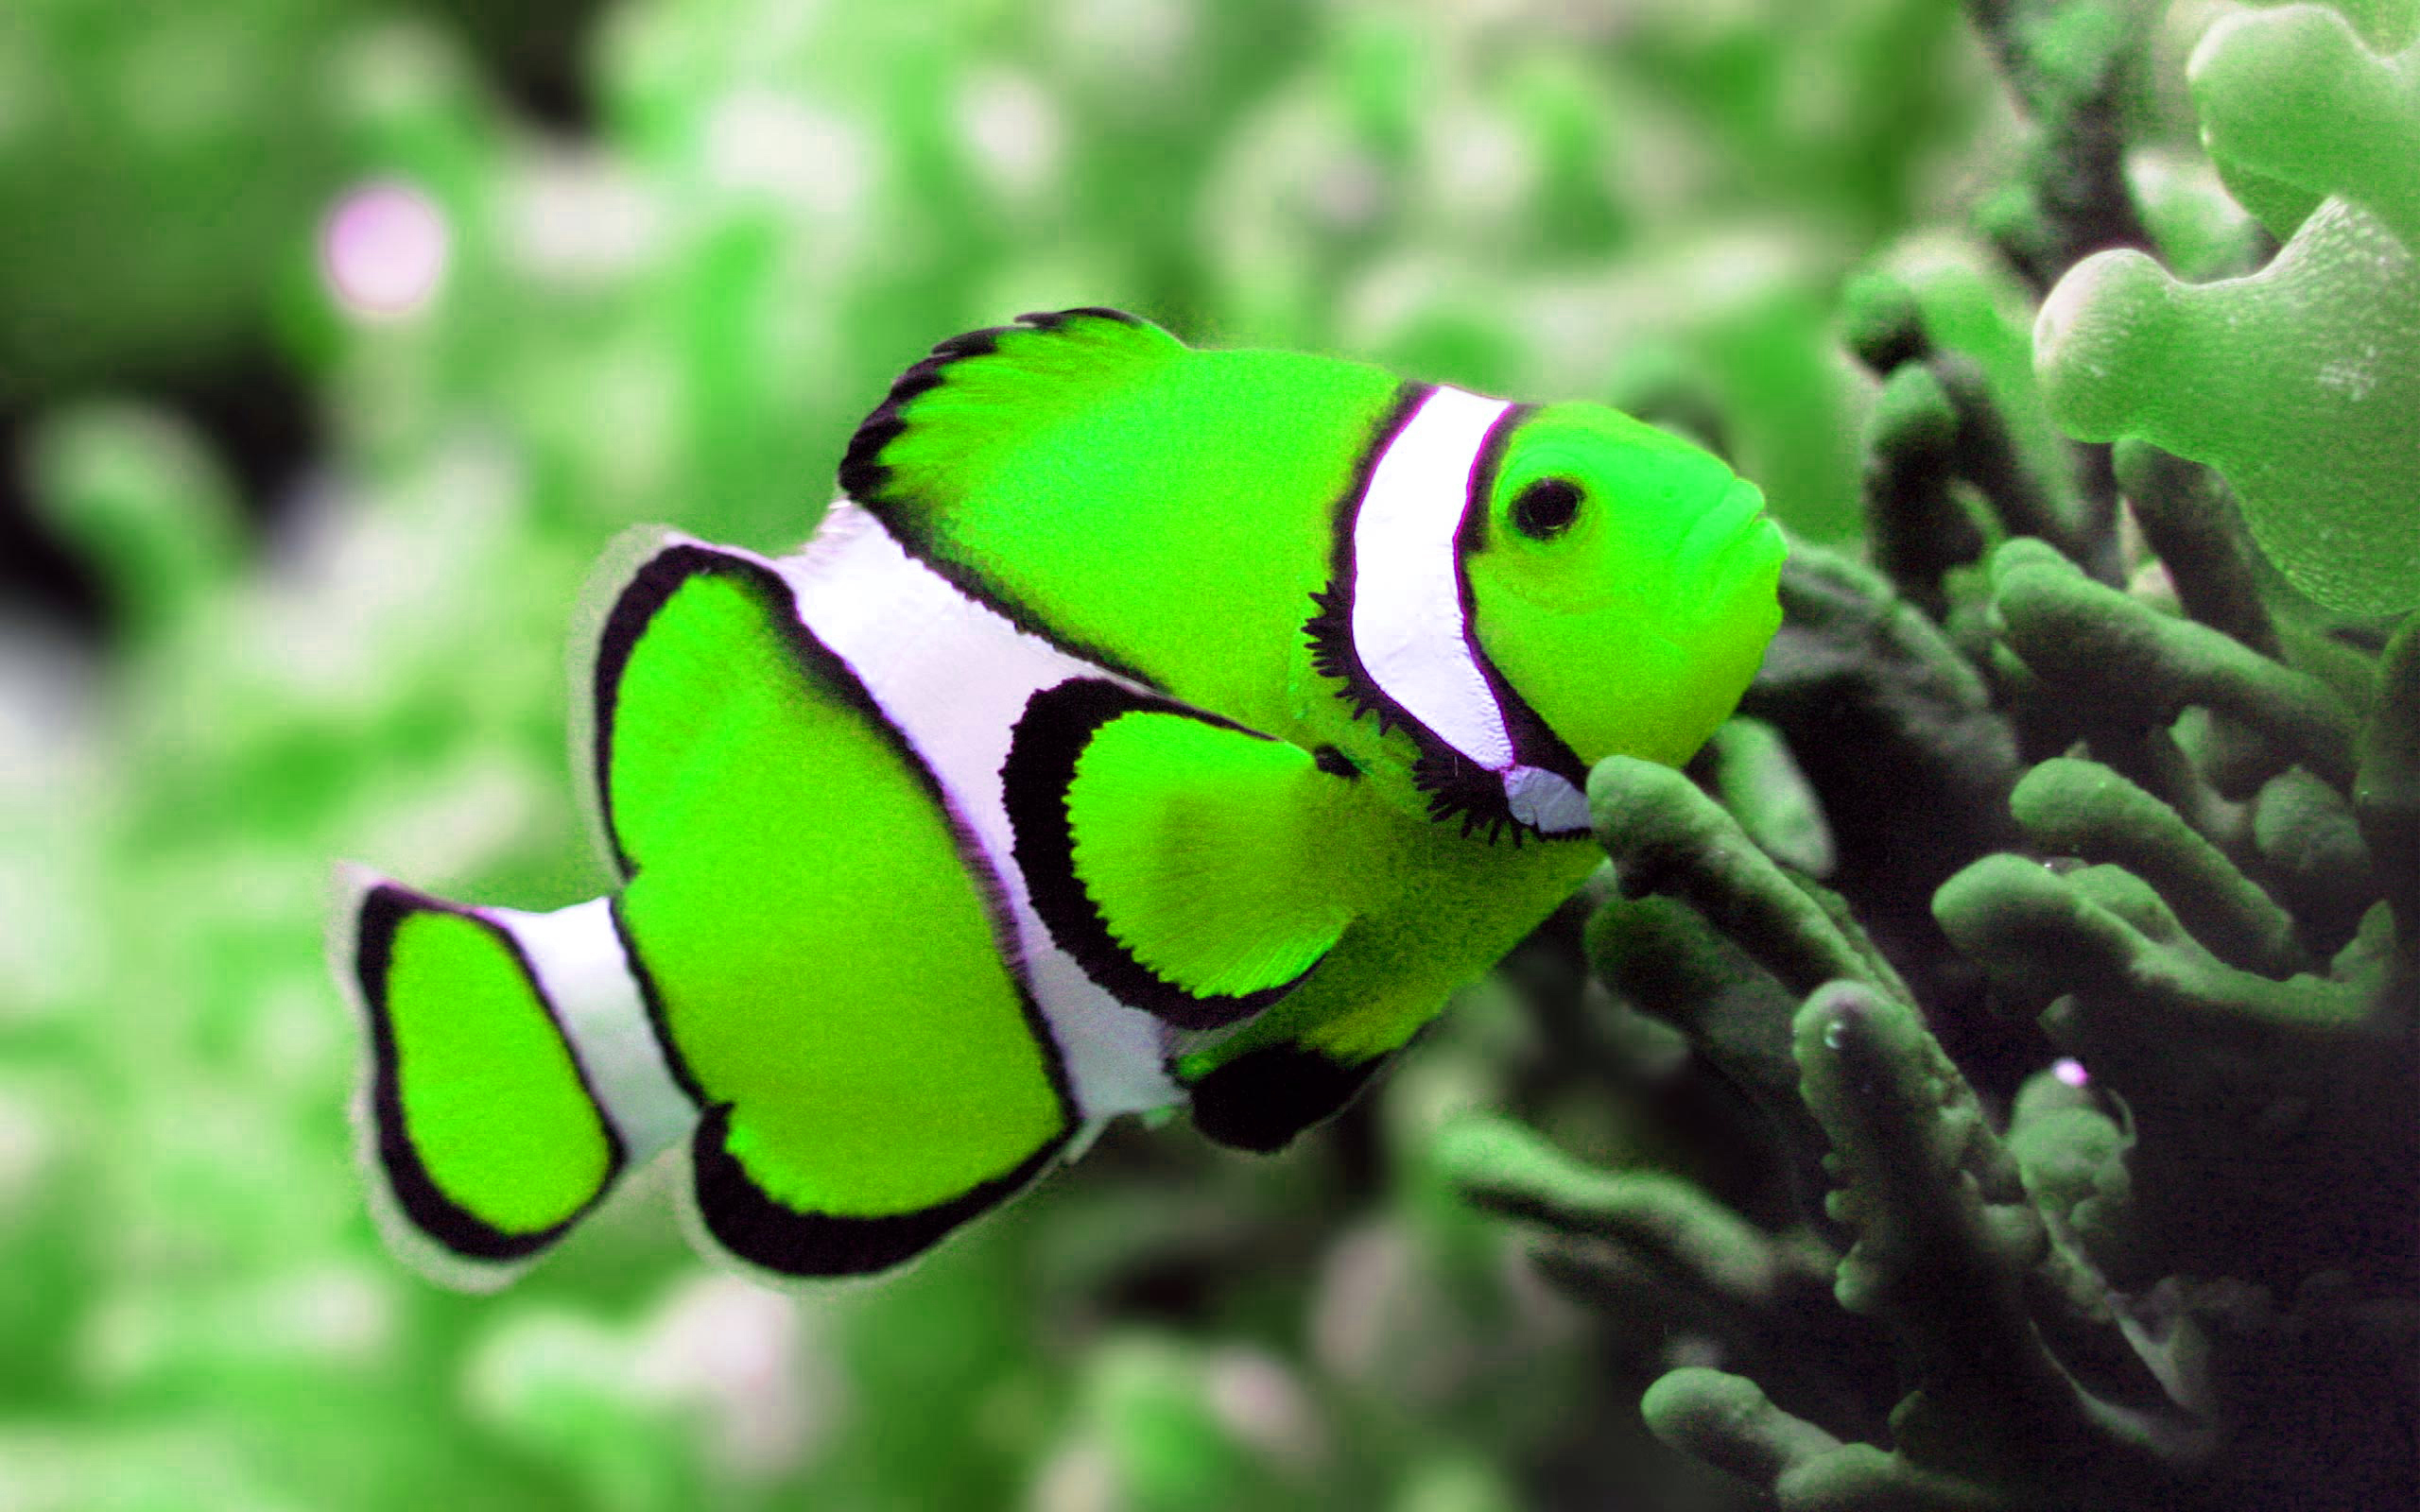 fish photo green